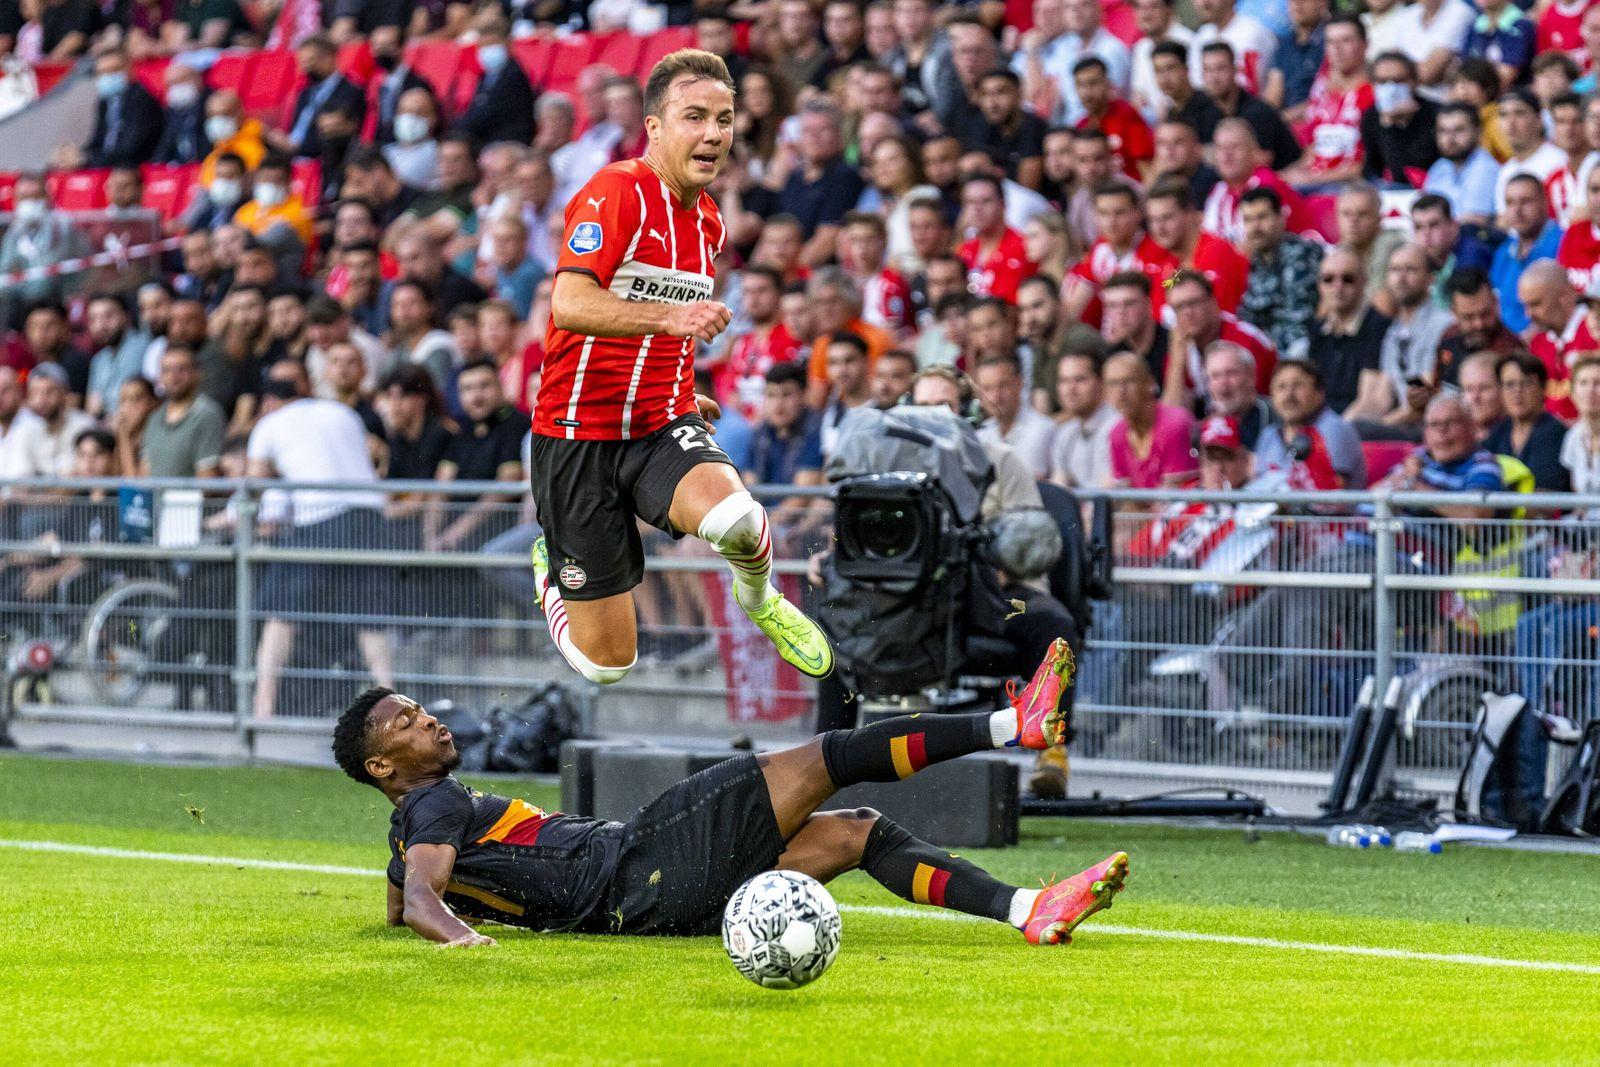 EINDHOVEN, Netherlands, 21-07-2021, football, Philips stadium, second qualification round Champions League, season 2021